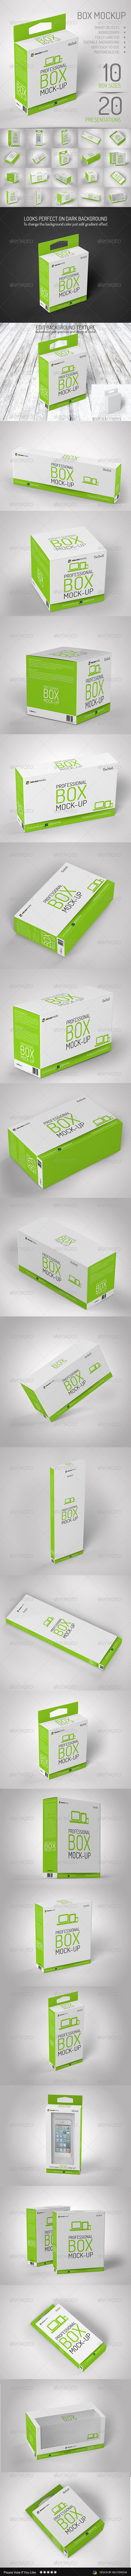 GraphicRiver Box Mock-Up 8243954